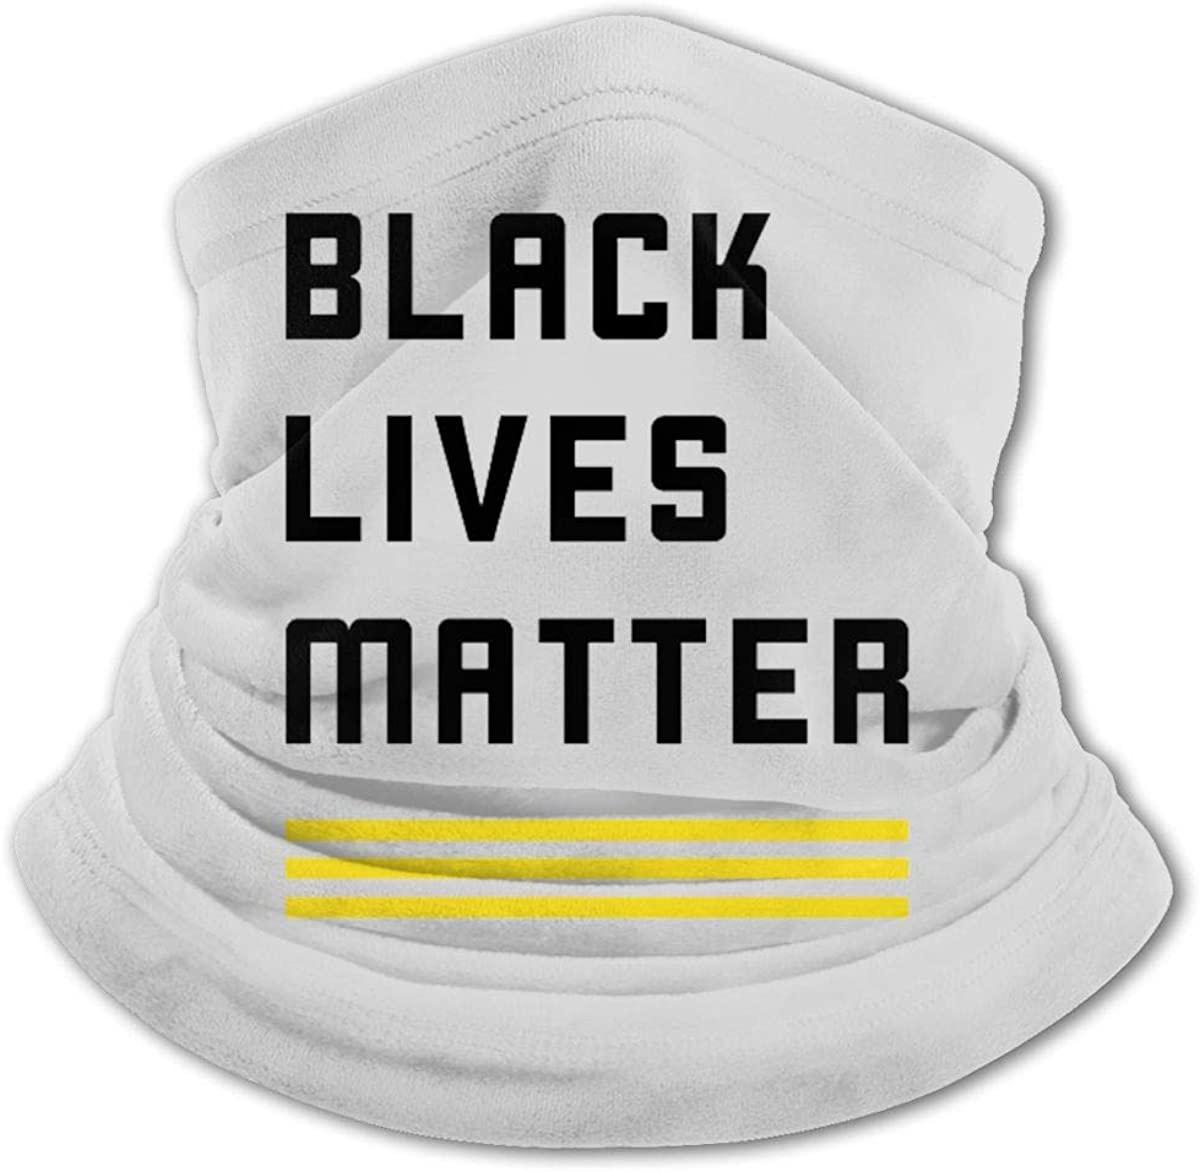 Black Lives Matter Blm Youth Face Mask Bandanas Neck Gaiter Headband Boy Girl Scarf Balaclava for Cycling Hiking Sport